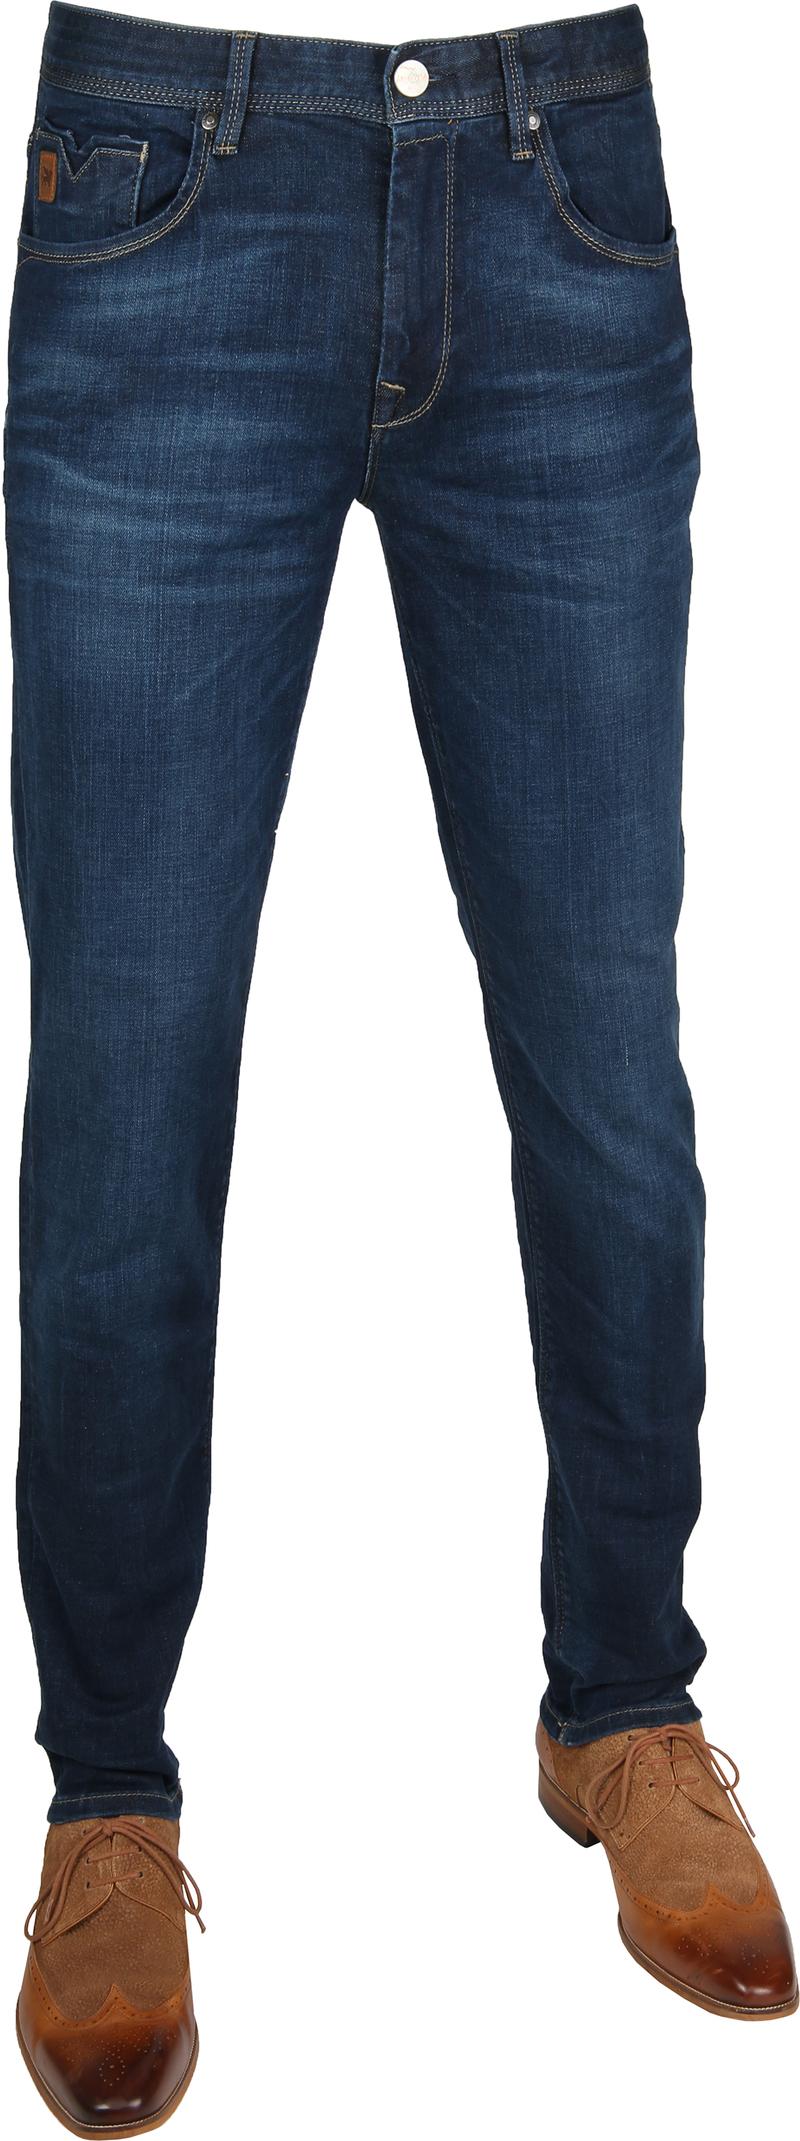 Vanguard Jeans V7 Rider Pure Blue photo 0